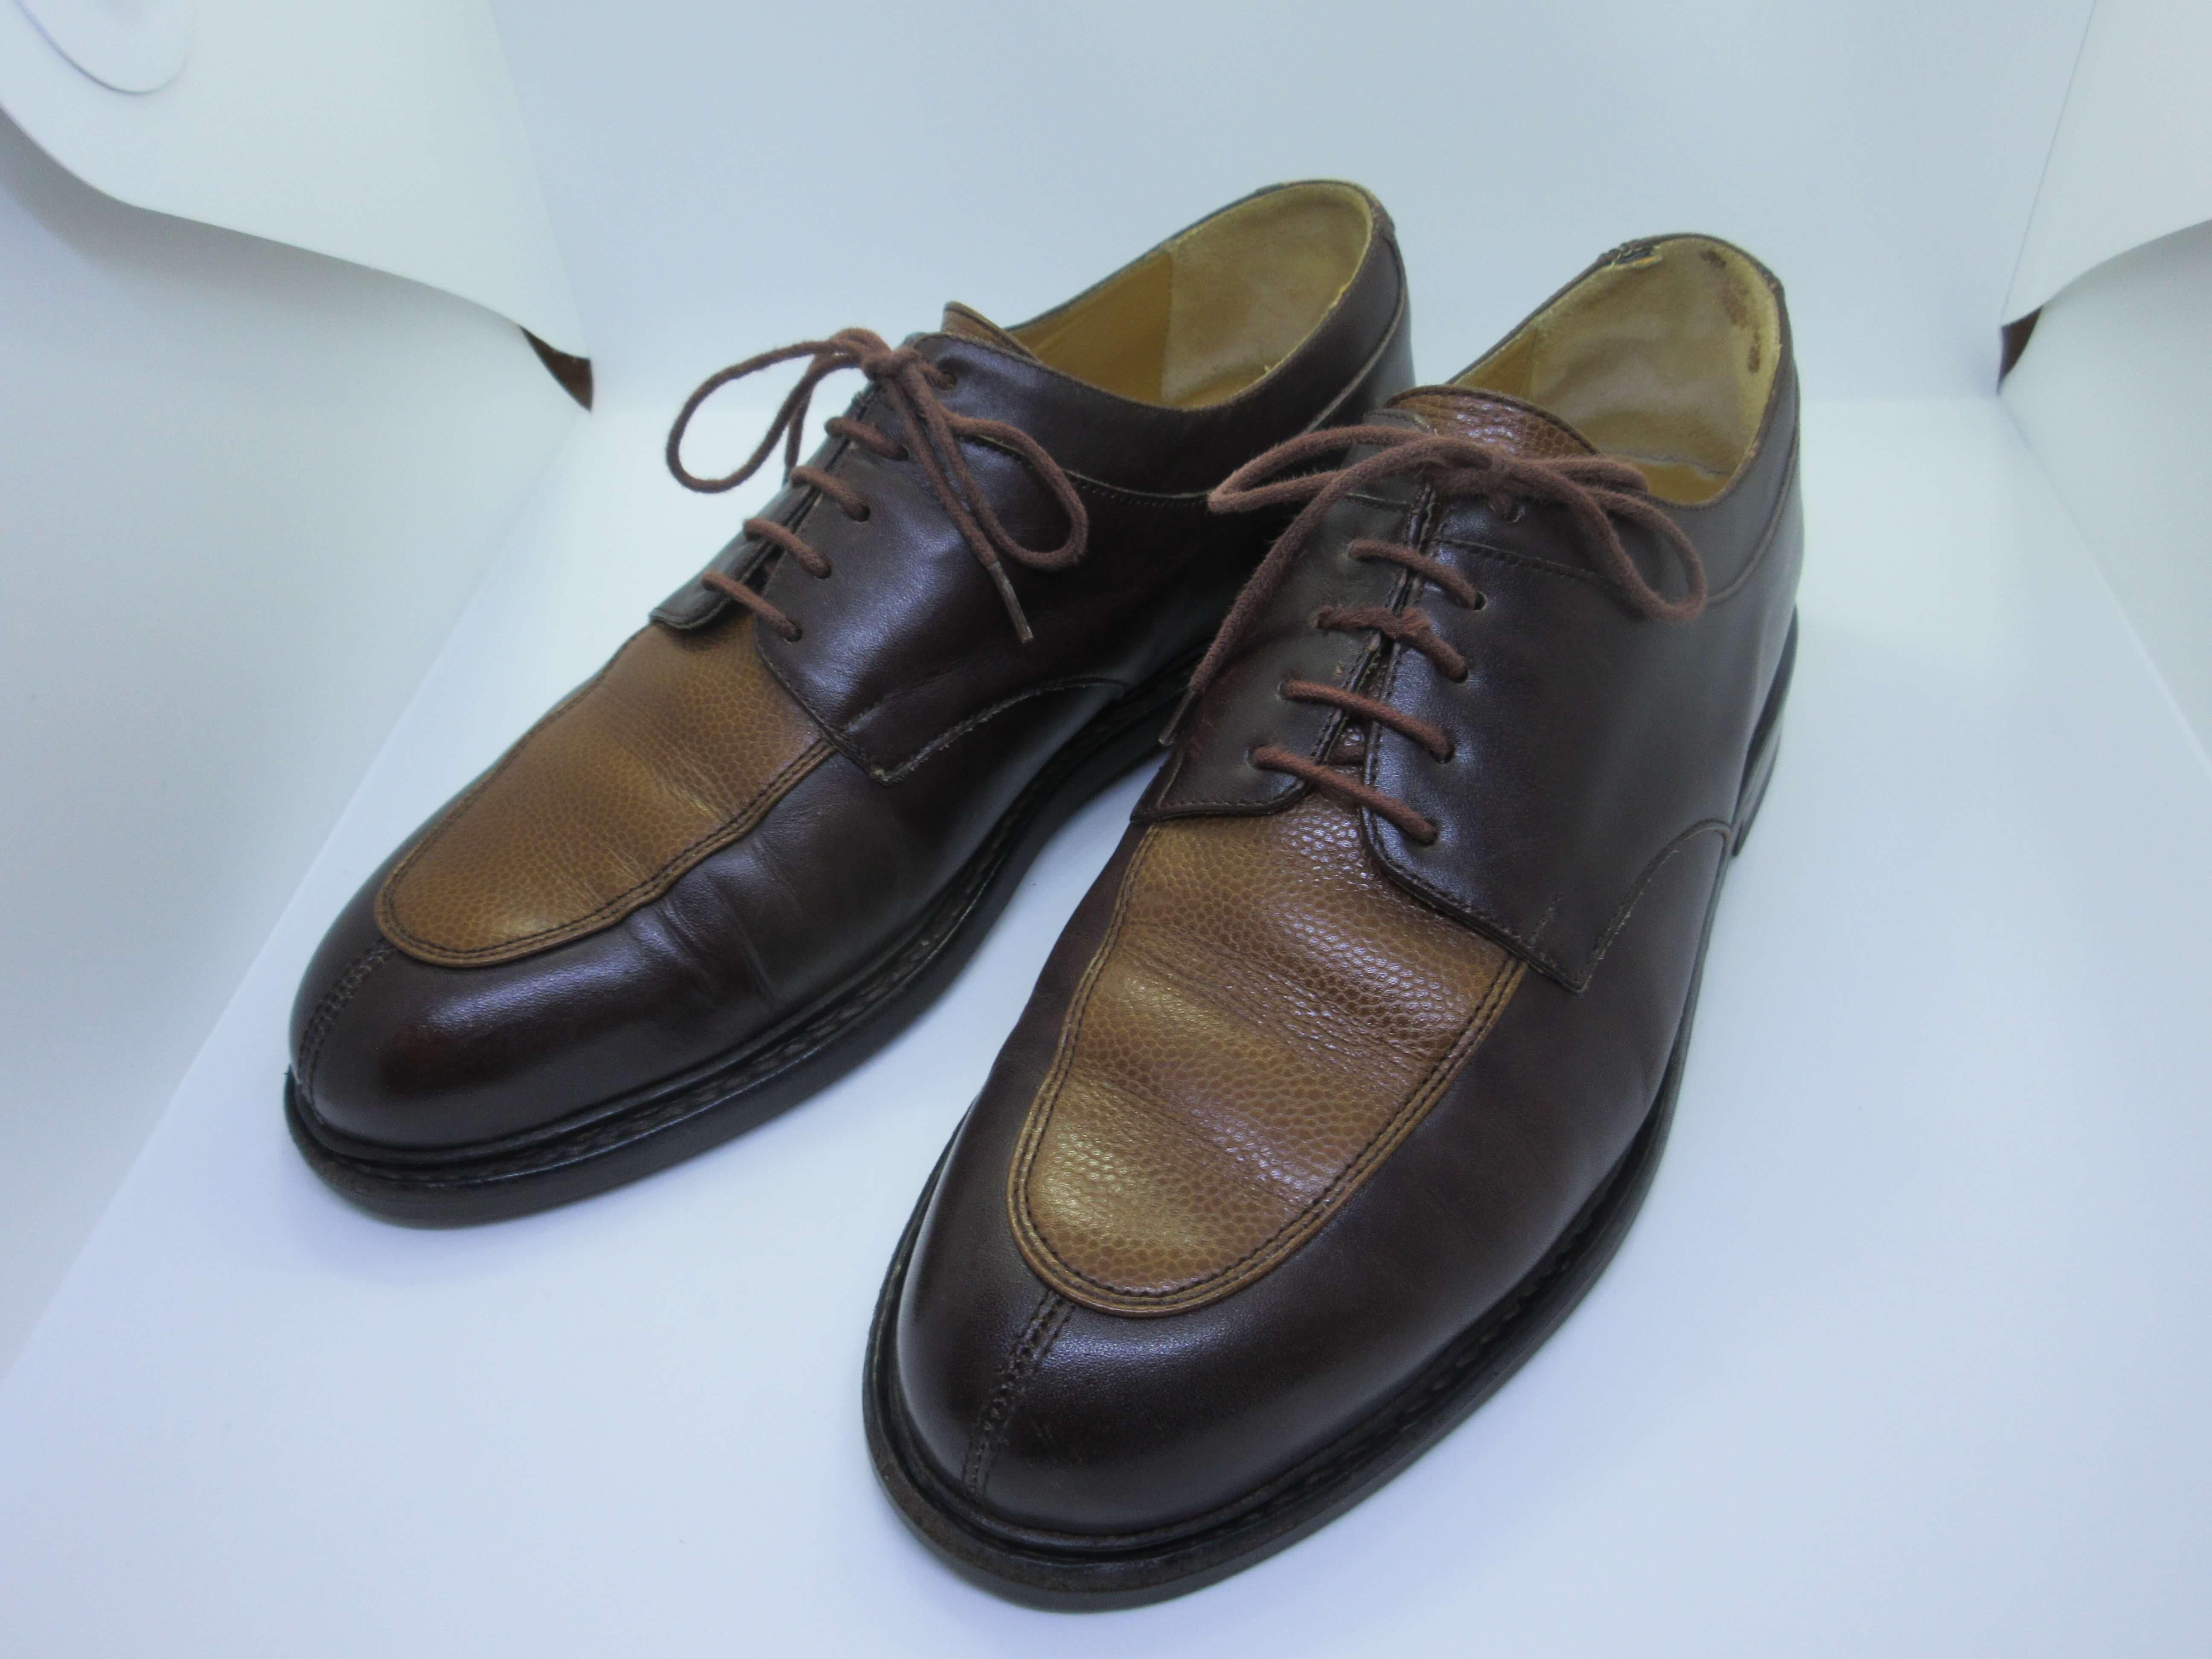 hardrige shoes # gerald 私物